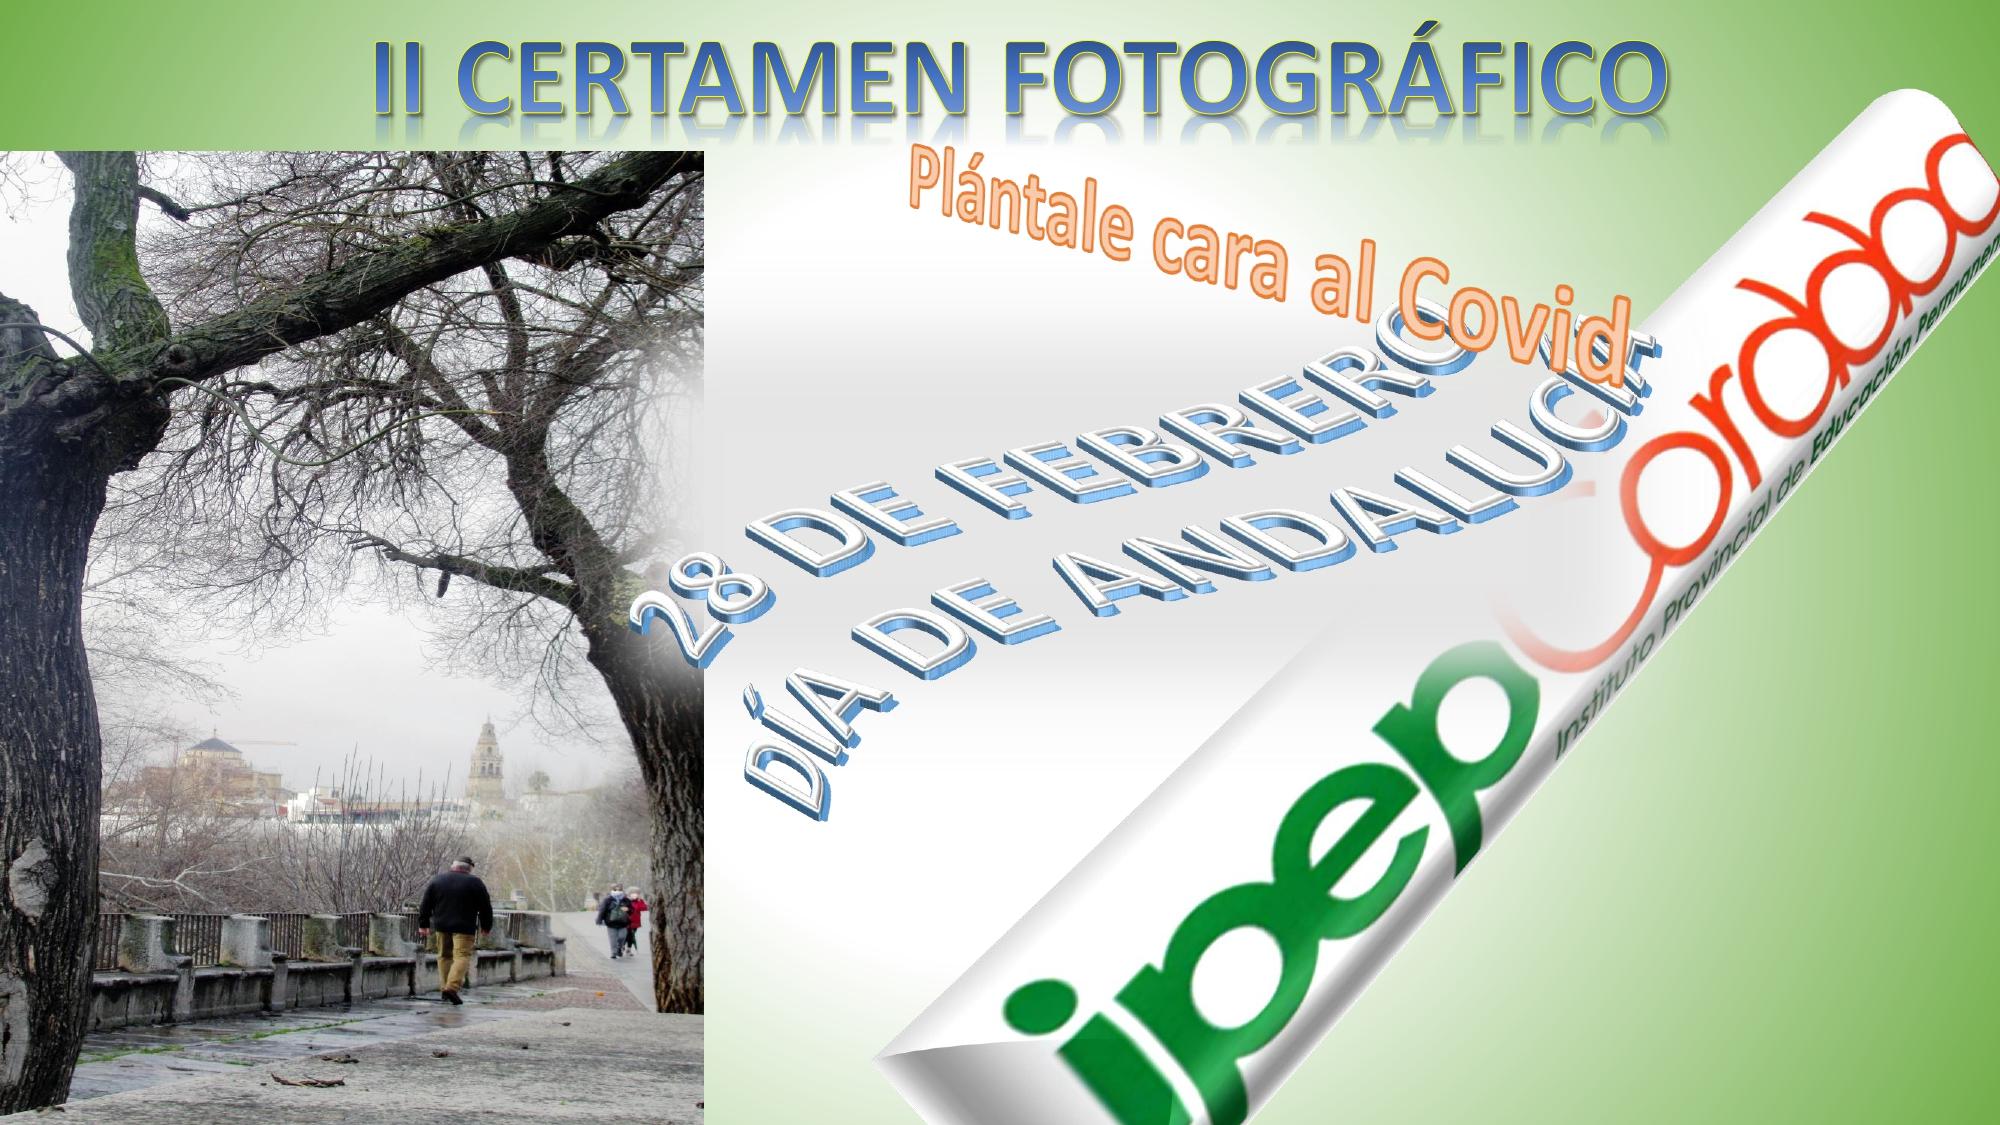 II-certamen-fotográfico_pages-to-jpg-0001